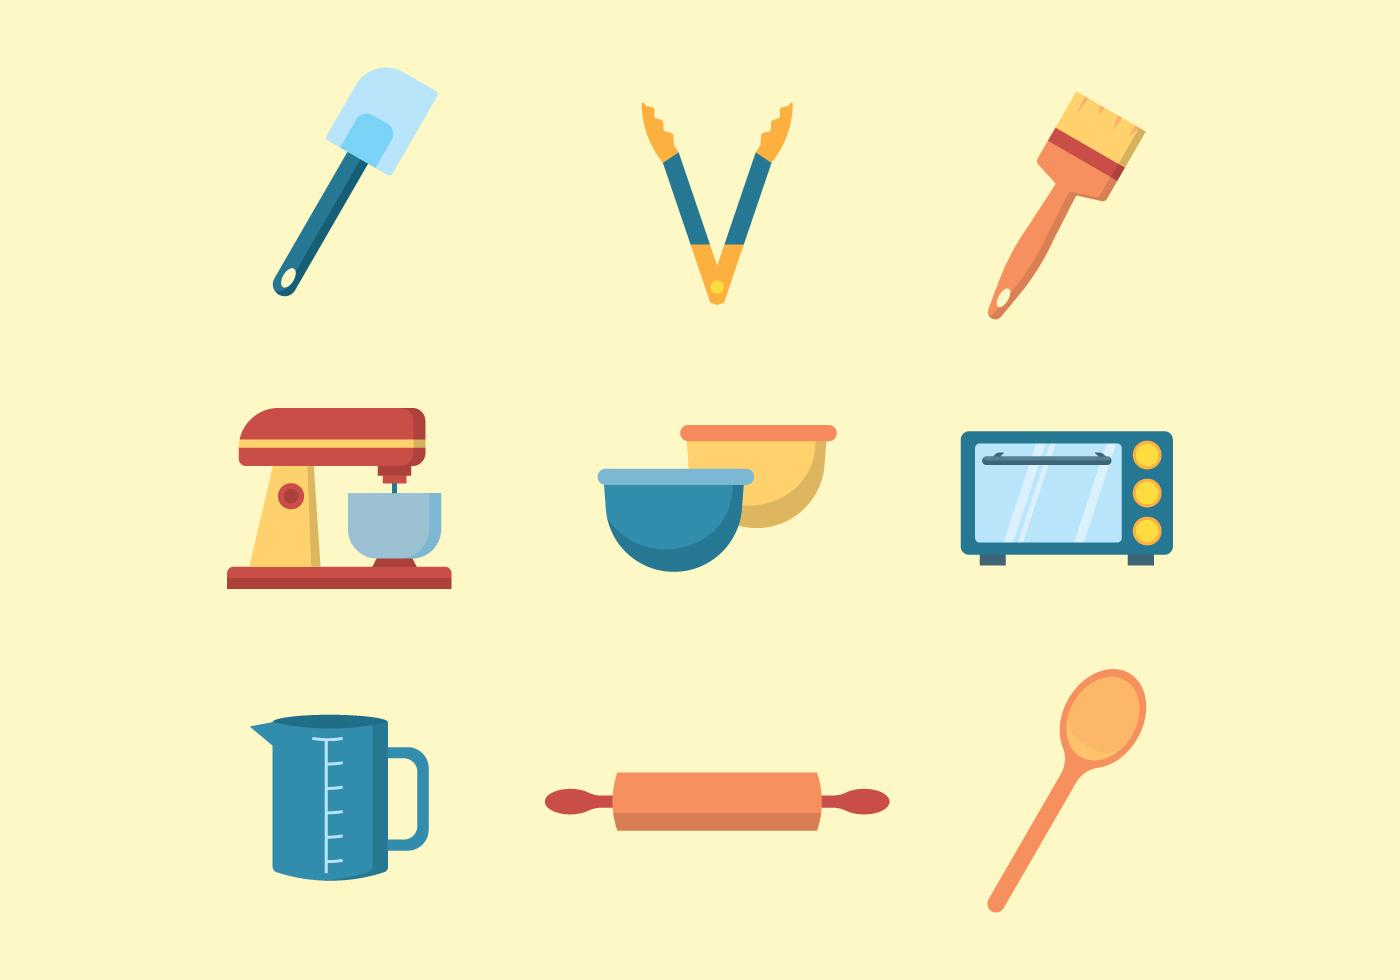 Free Baking Equiment Download Free Vectors Clipart